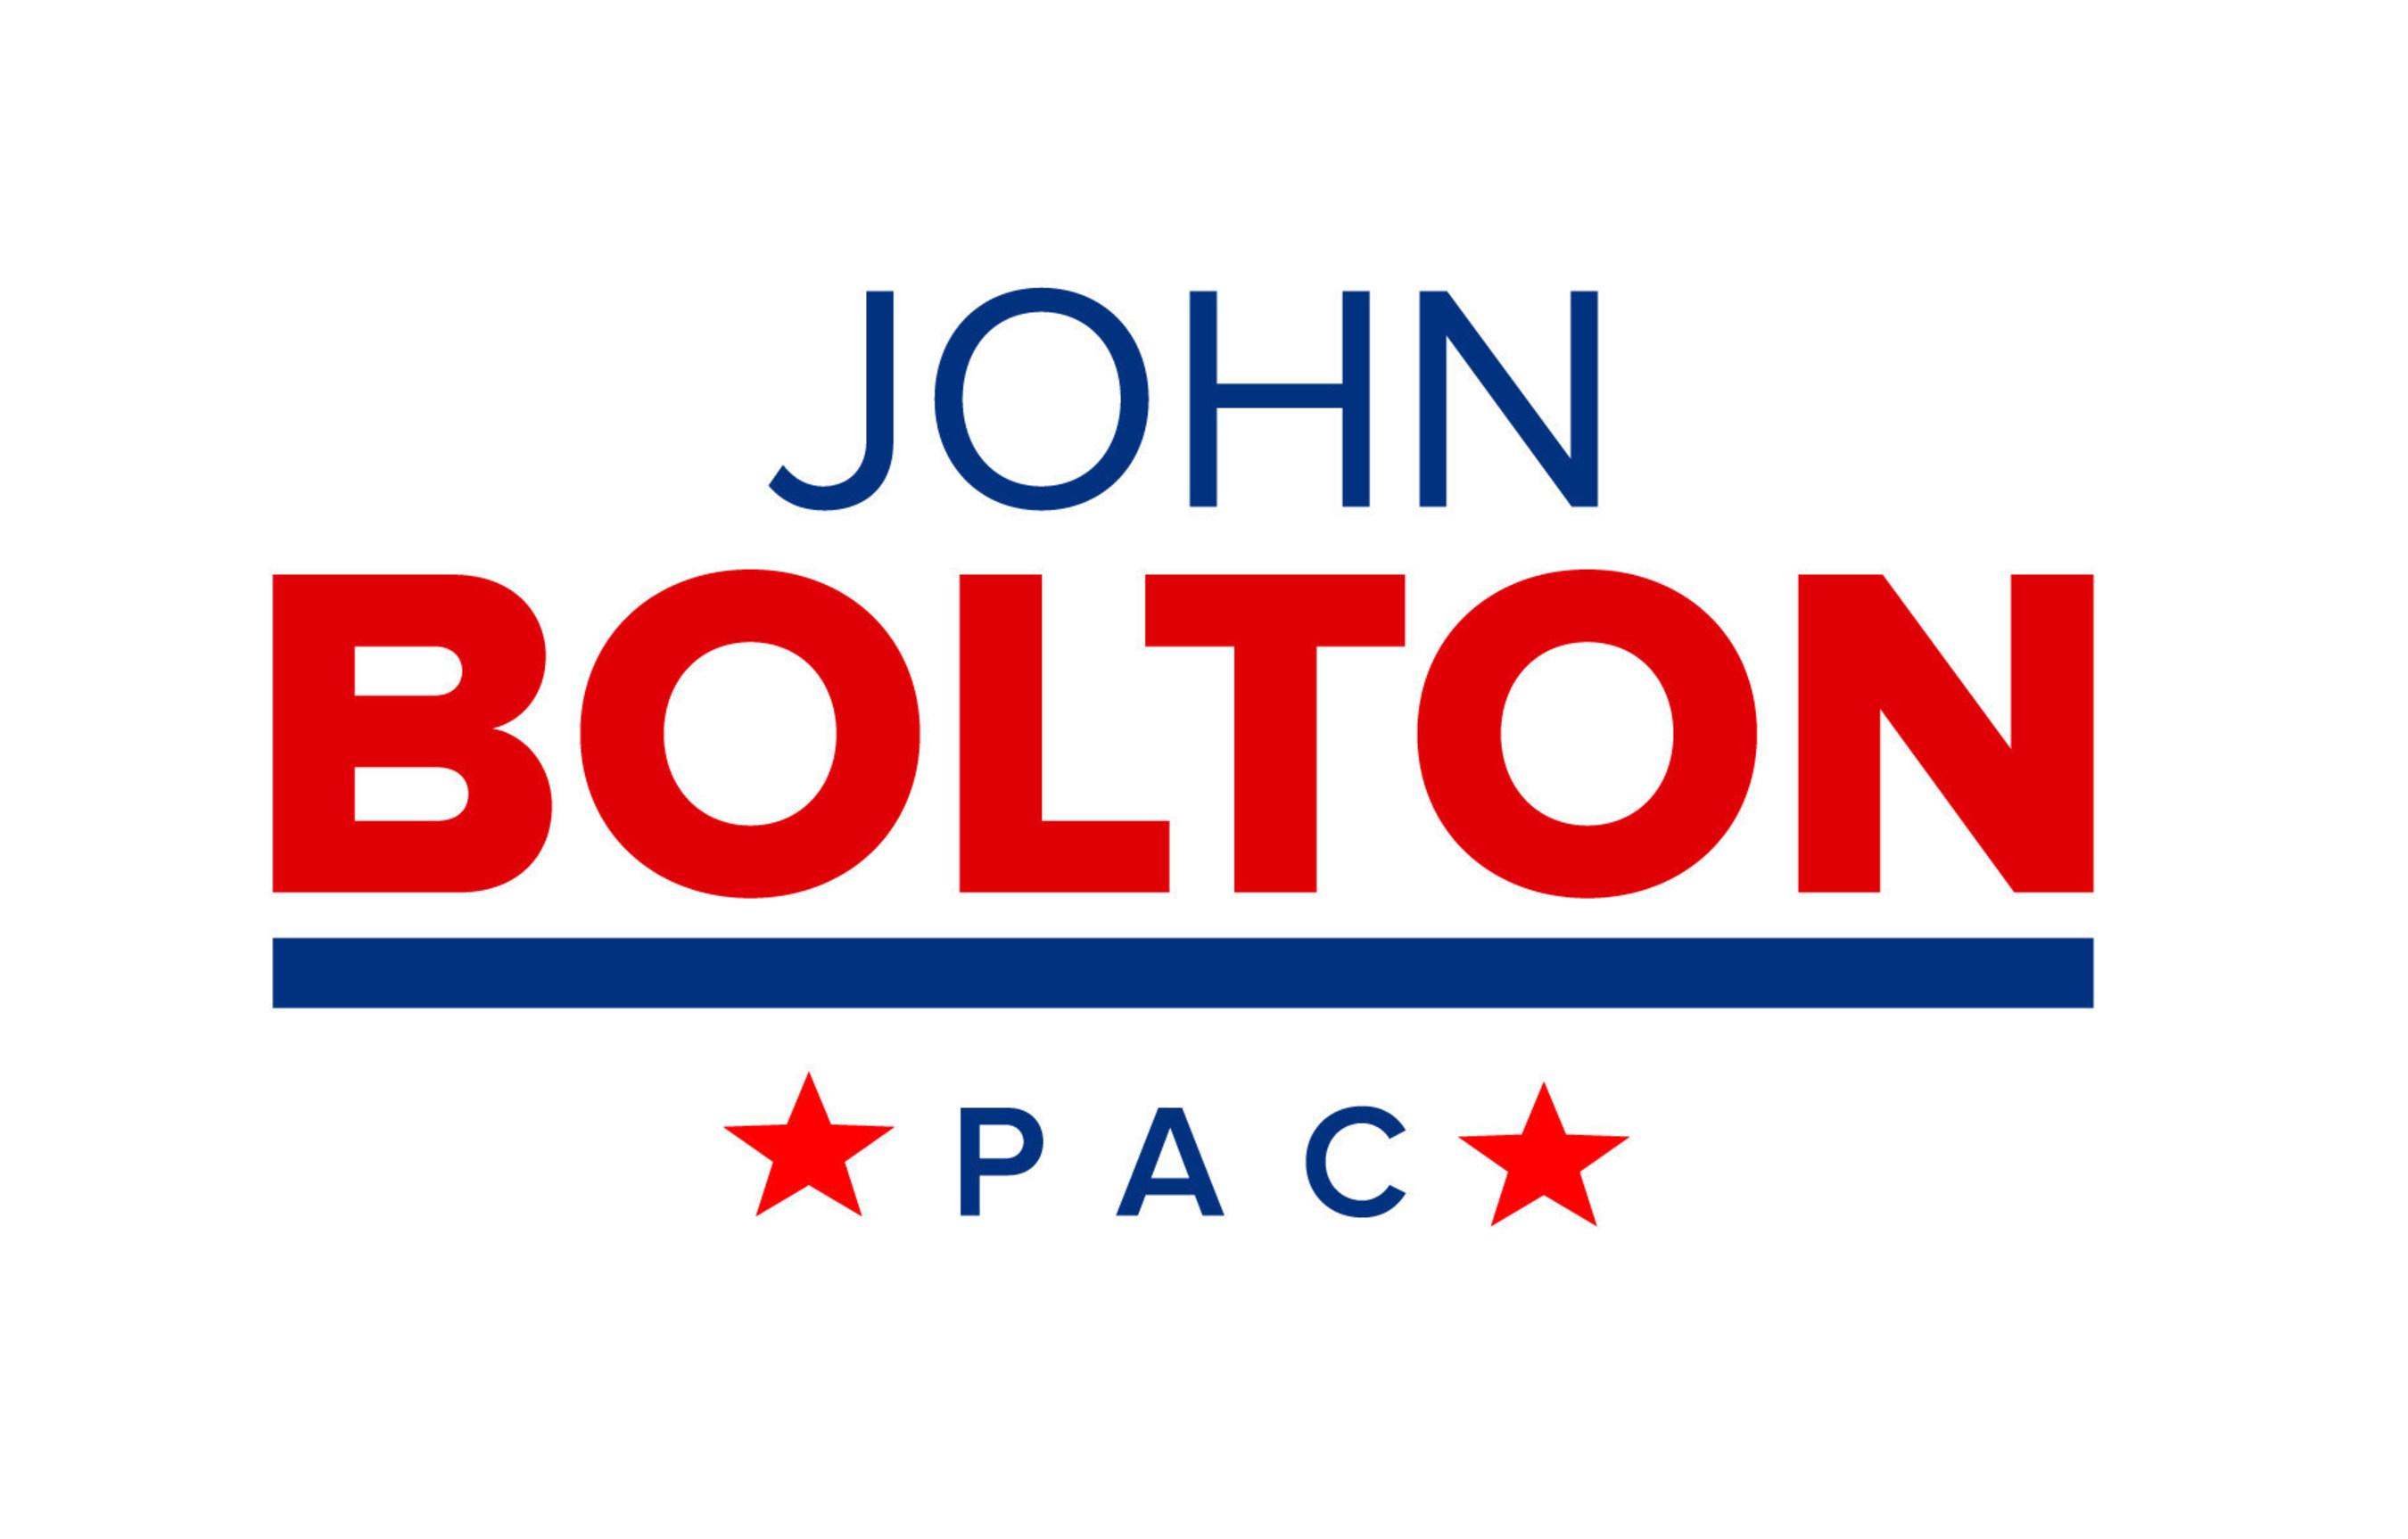 John Bolton PAC logo